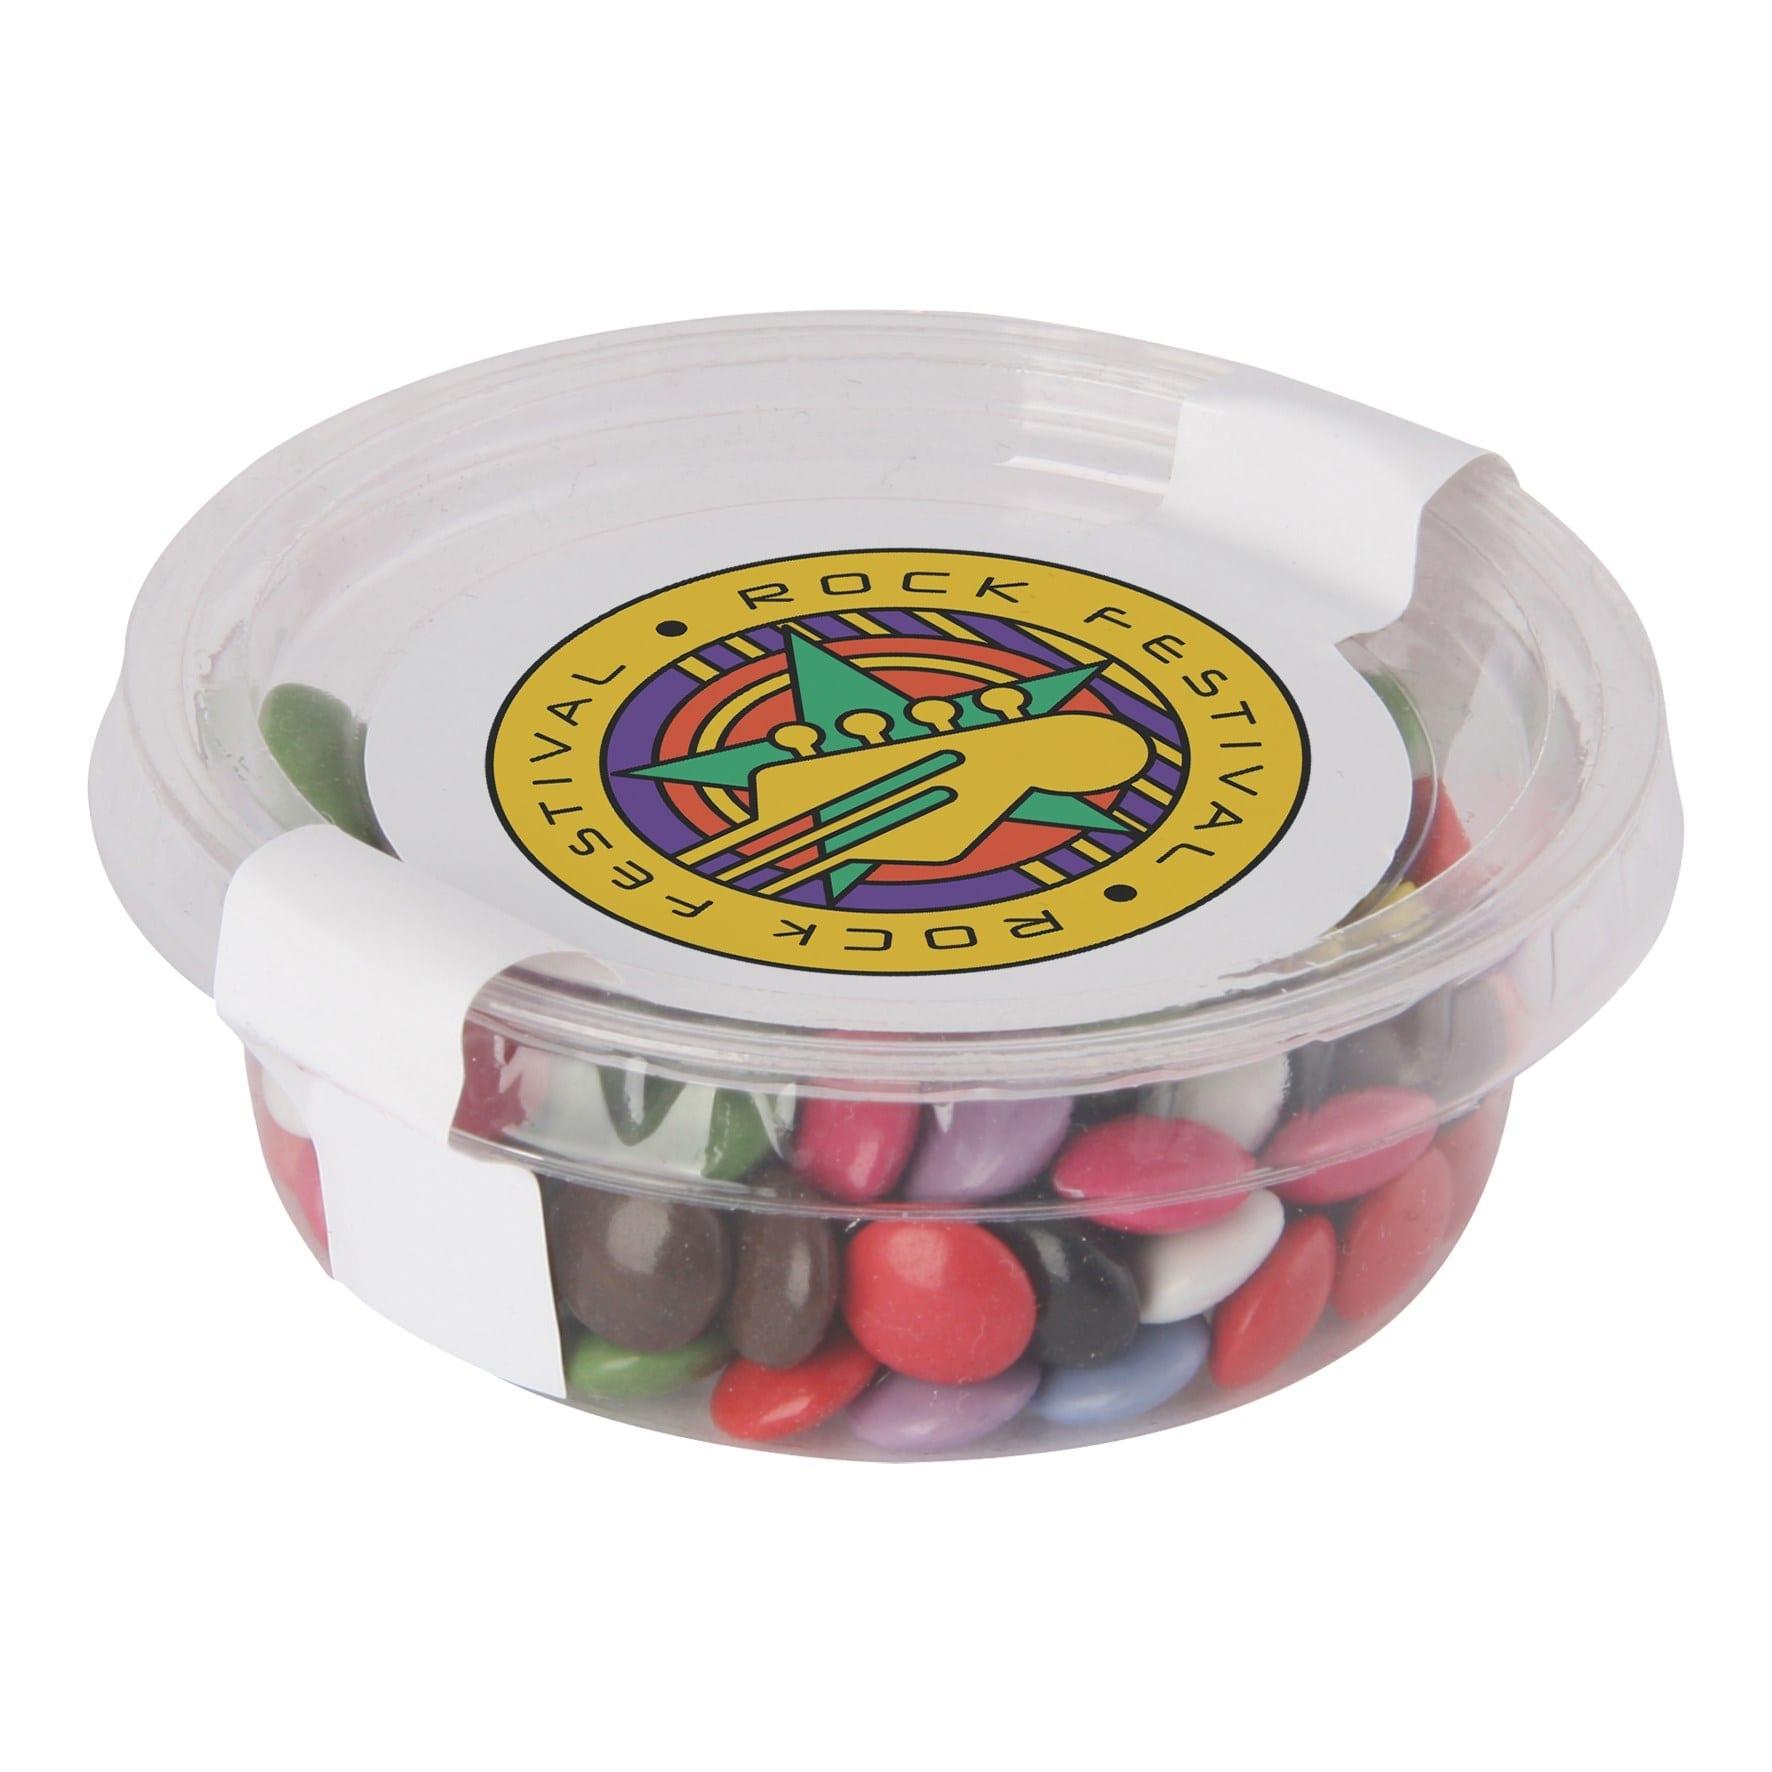 BioBrand Small sweet tub 40g